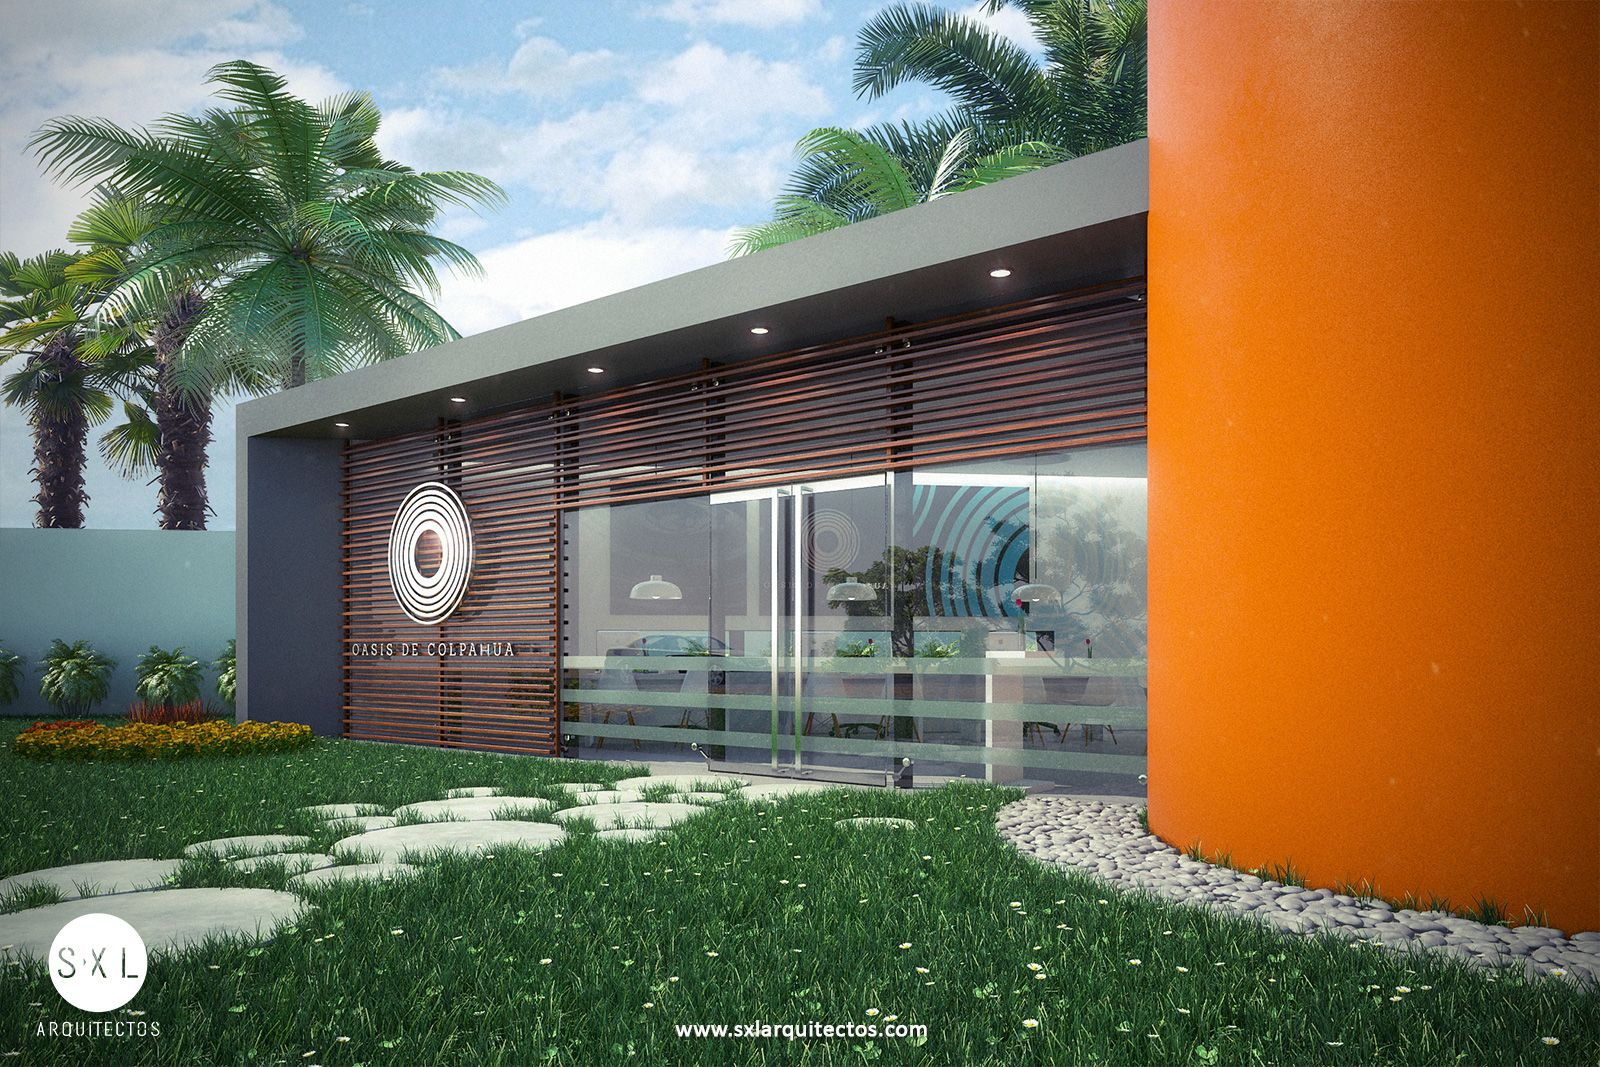 Sala De Ventas En Piura Para Proyecto Inmobiliario Diseno S Xl Arquitectos Restaurant Exterior Outdoor Decor Brick